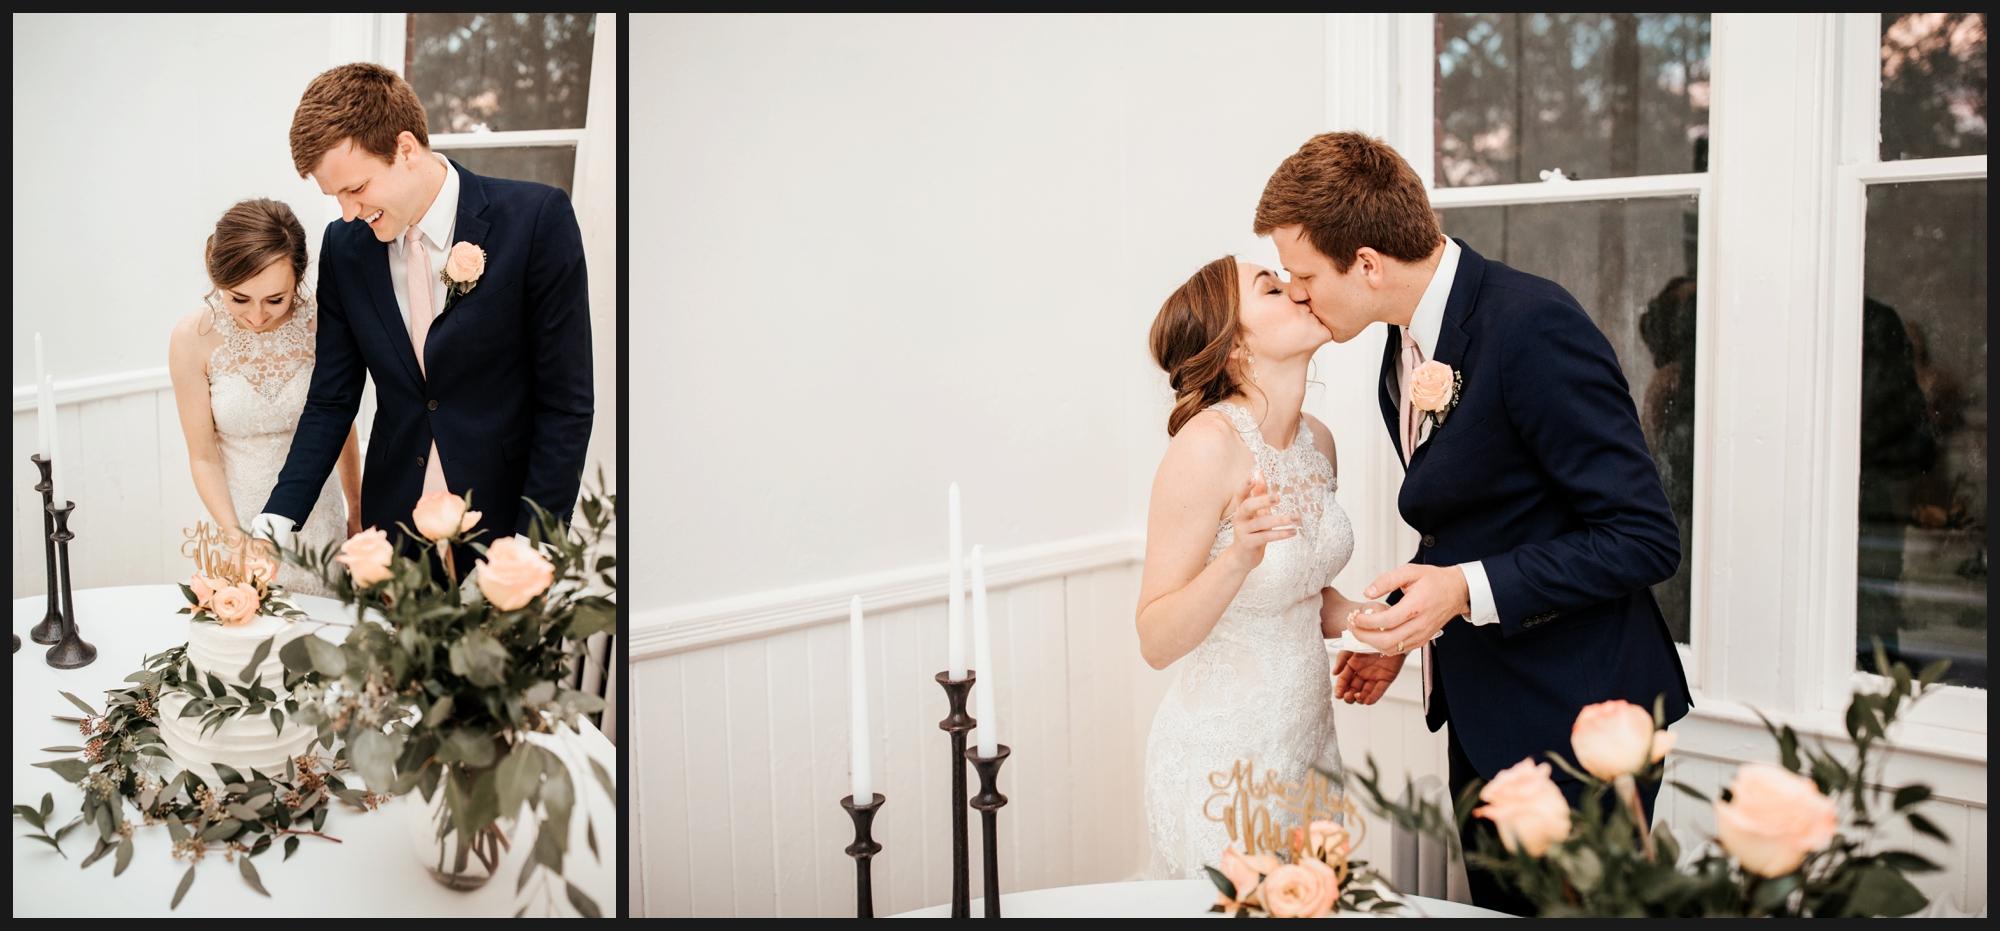 Orlando-Wedding-Photographer-destination-wedding-photographer-florida-wedding-photographer-bohemian-wedding-photographer_1694.jpg